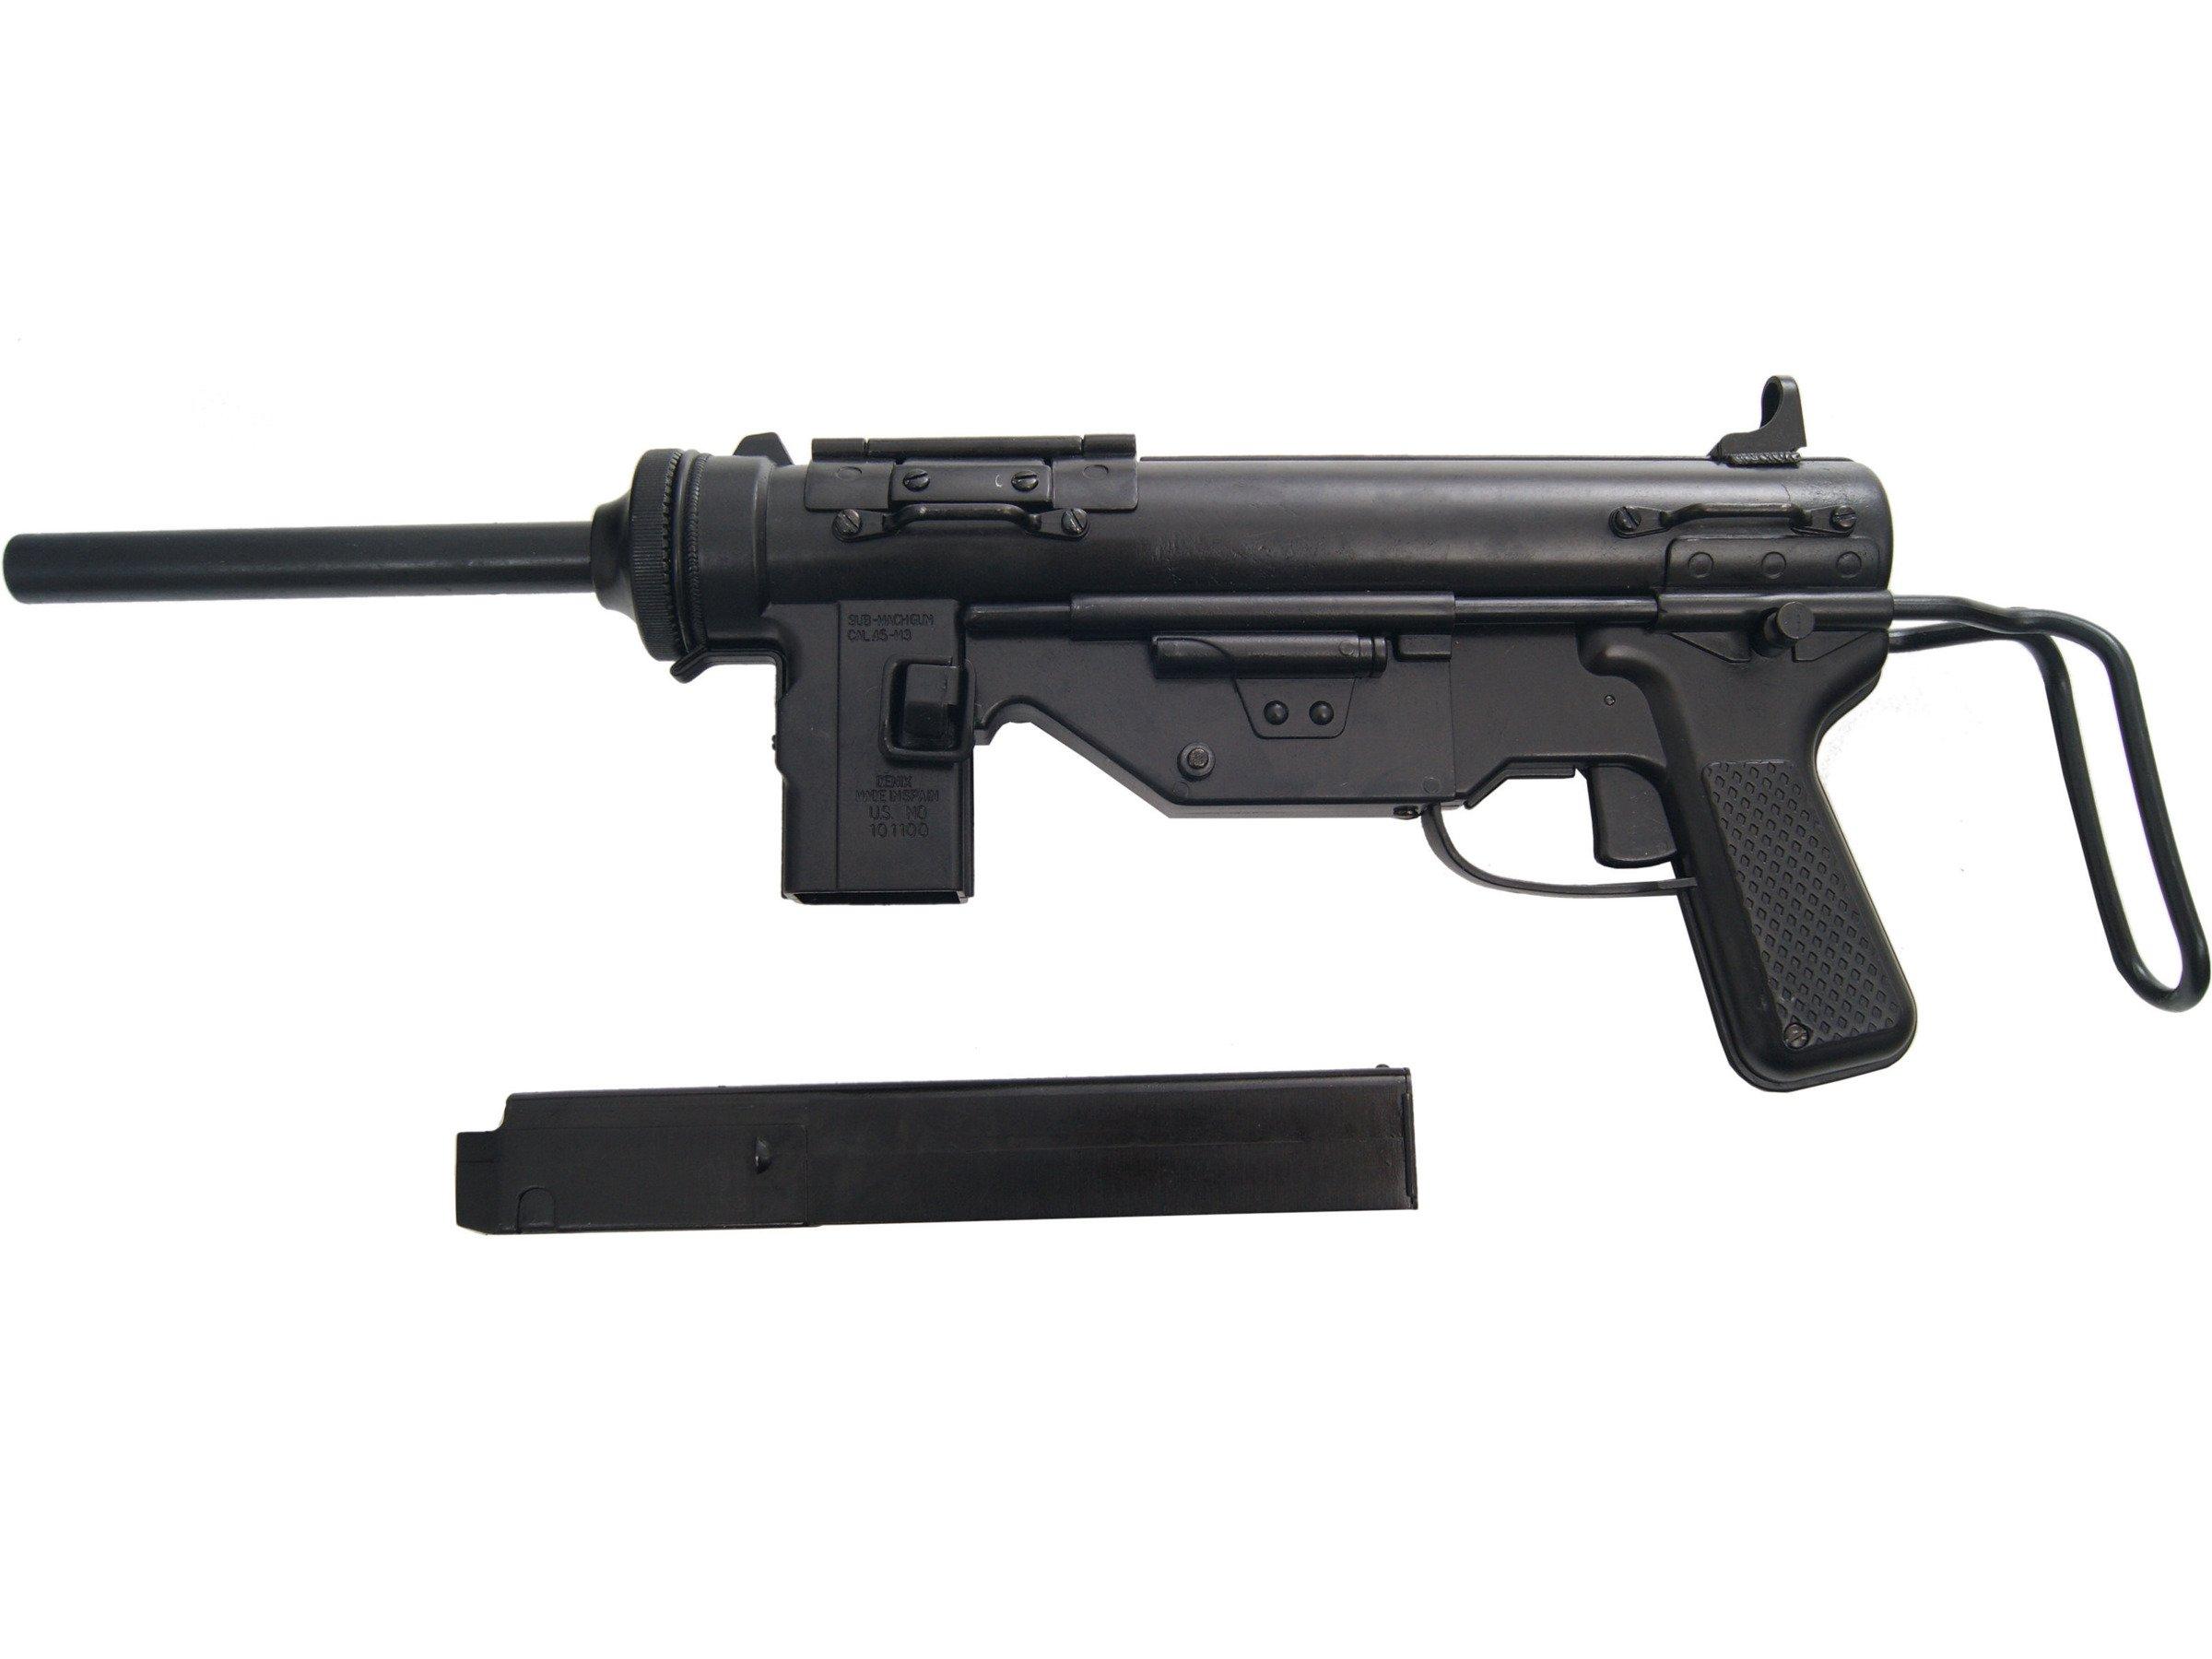 U  S  Submachine Gun, Cal   45, M3 - Grease Gun - model gun